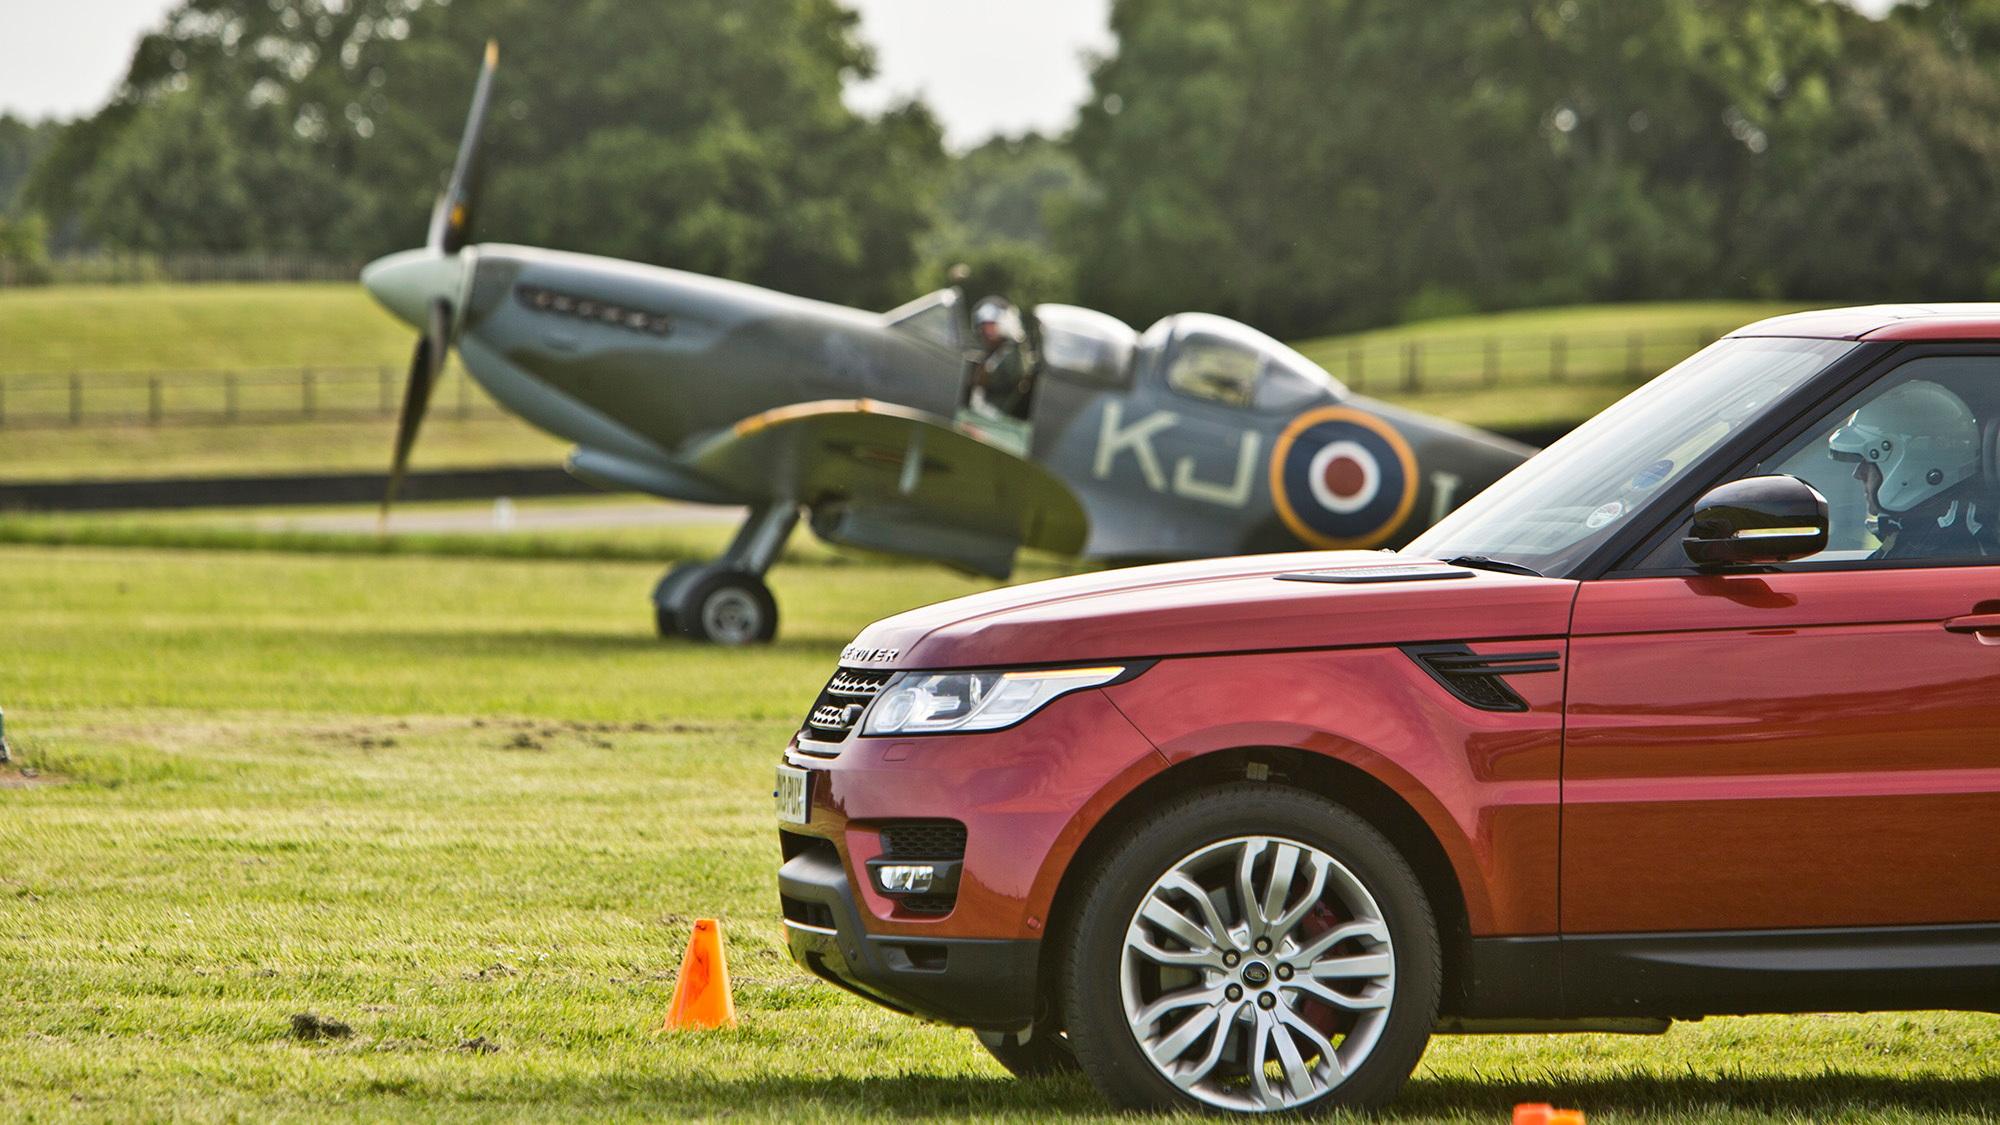 Range Rover Sport versus Spitfire